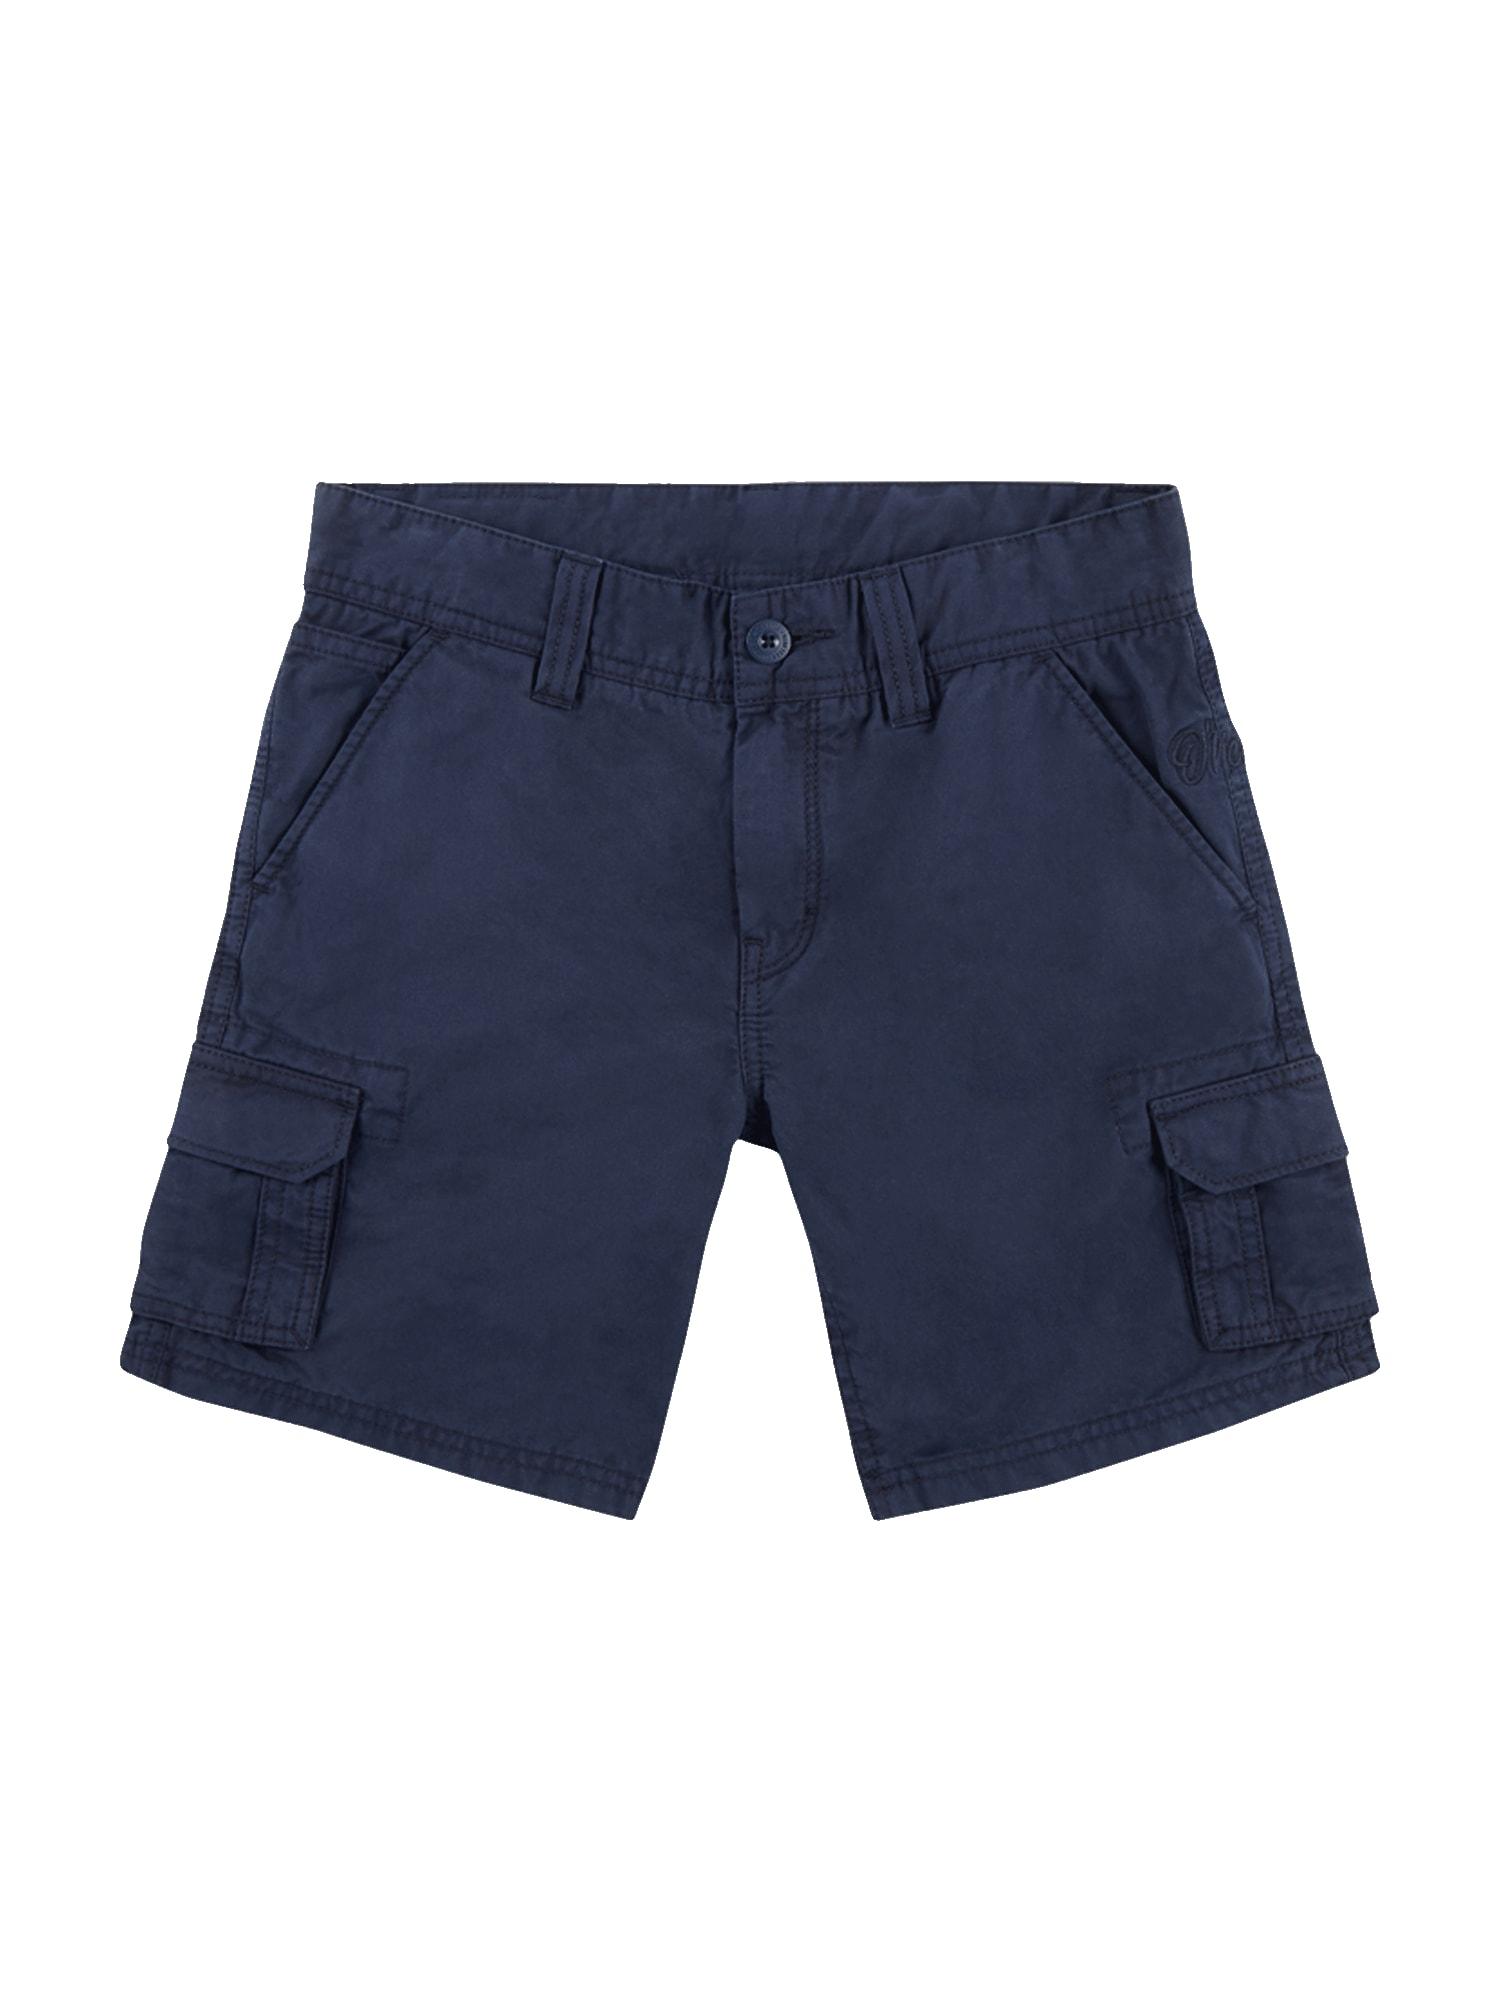 O'NEILL Kelnės 'CALI BEACH' tamsiai mėlyna